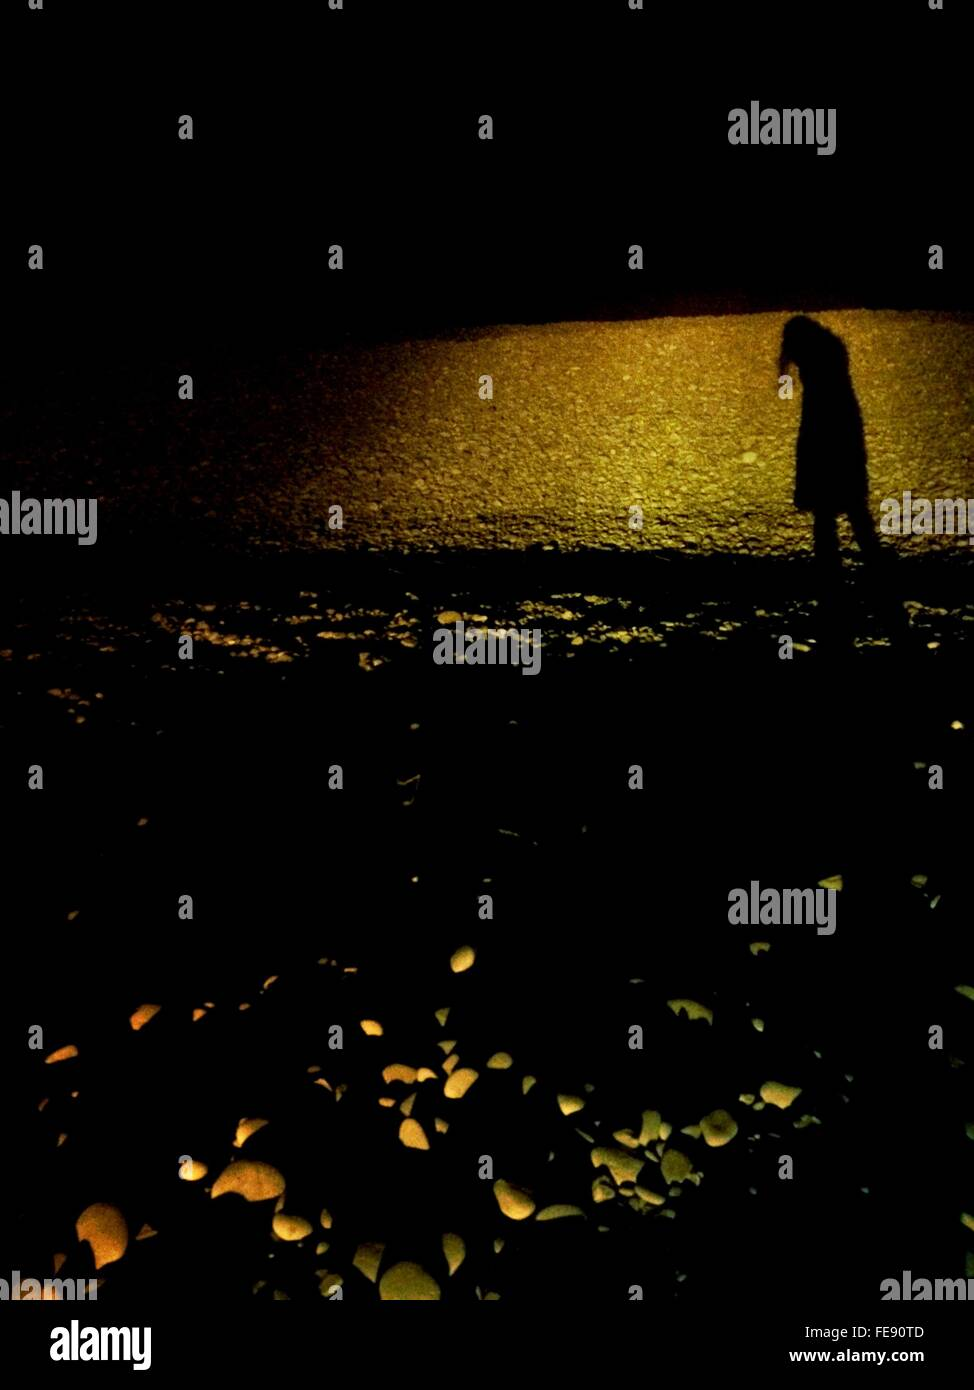 Silhouette Woman On Beach - Stock Image